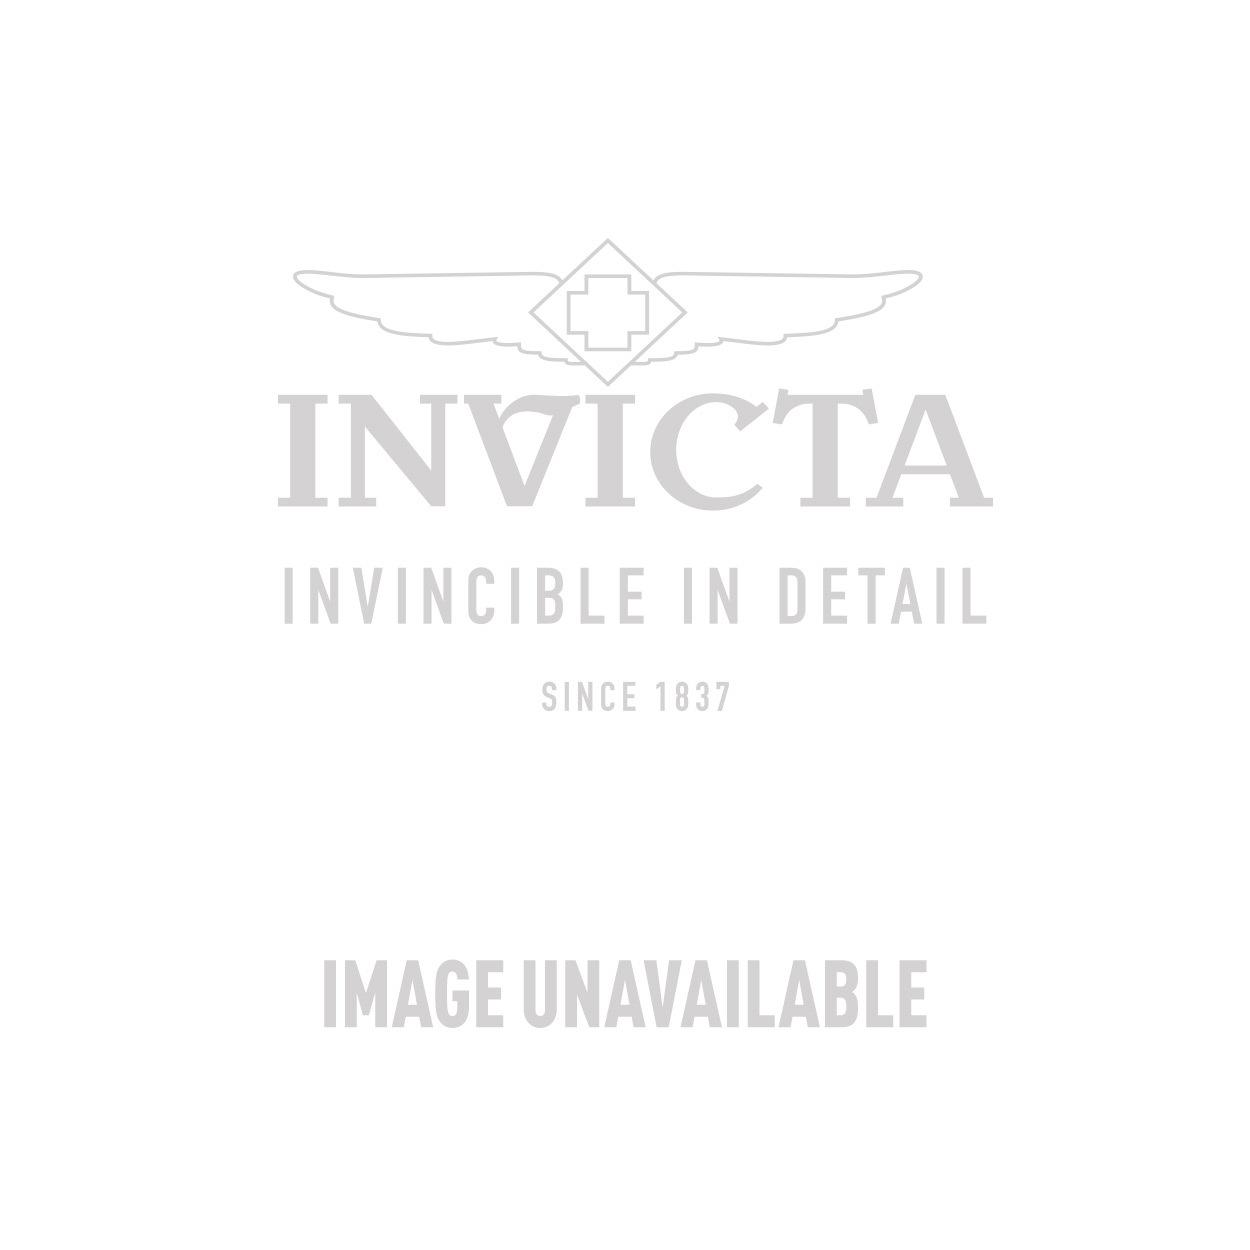 Invicta Corduba Swiss Movement Quartz Watch - Gold case with Gold, Blue tone Stainless Steel, Polyurethane band - Model 10619